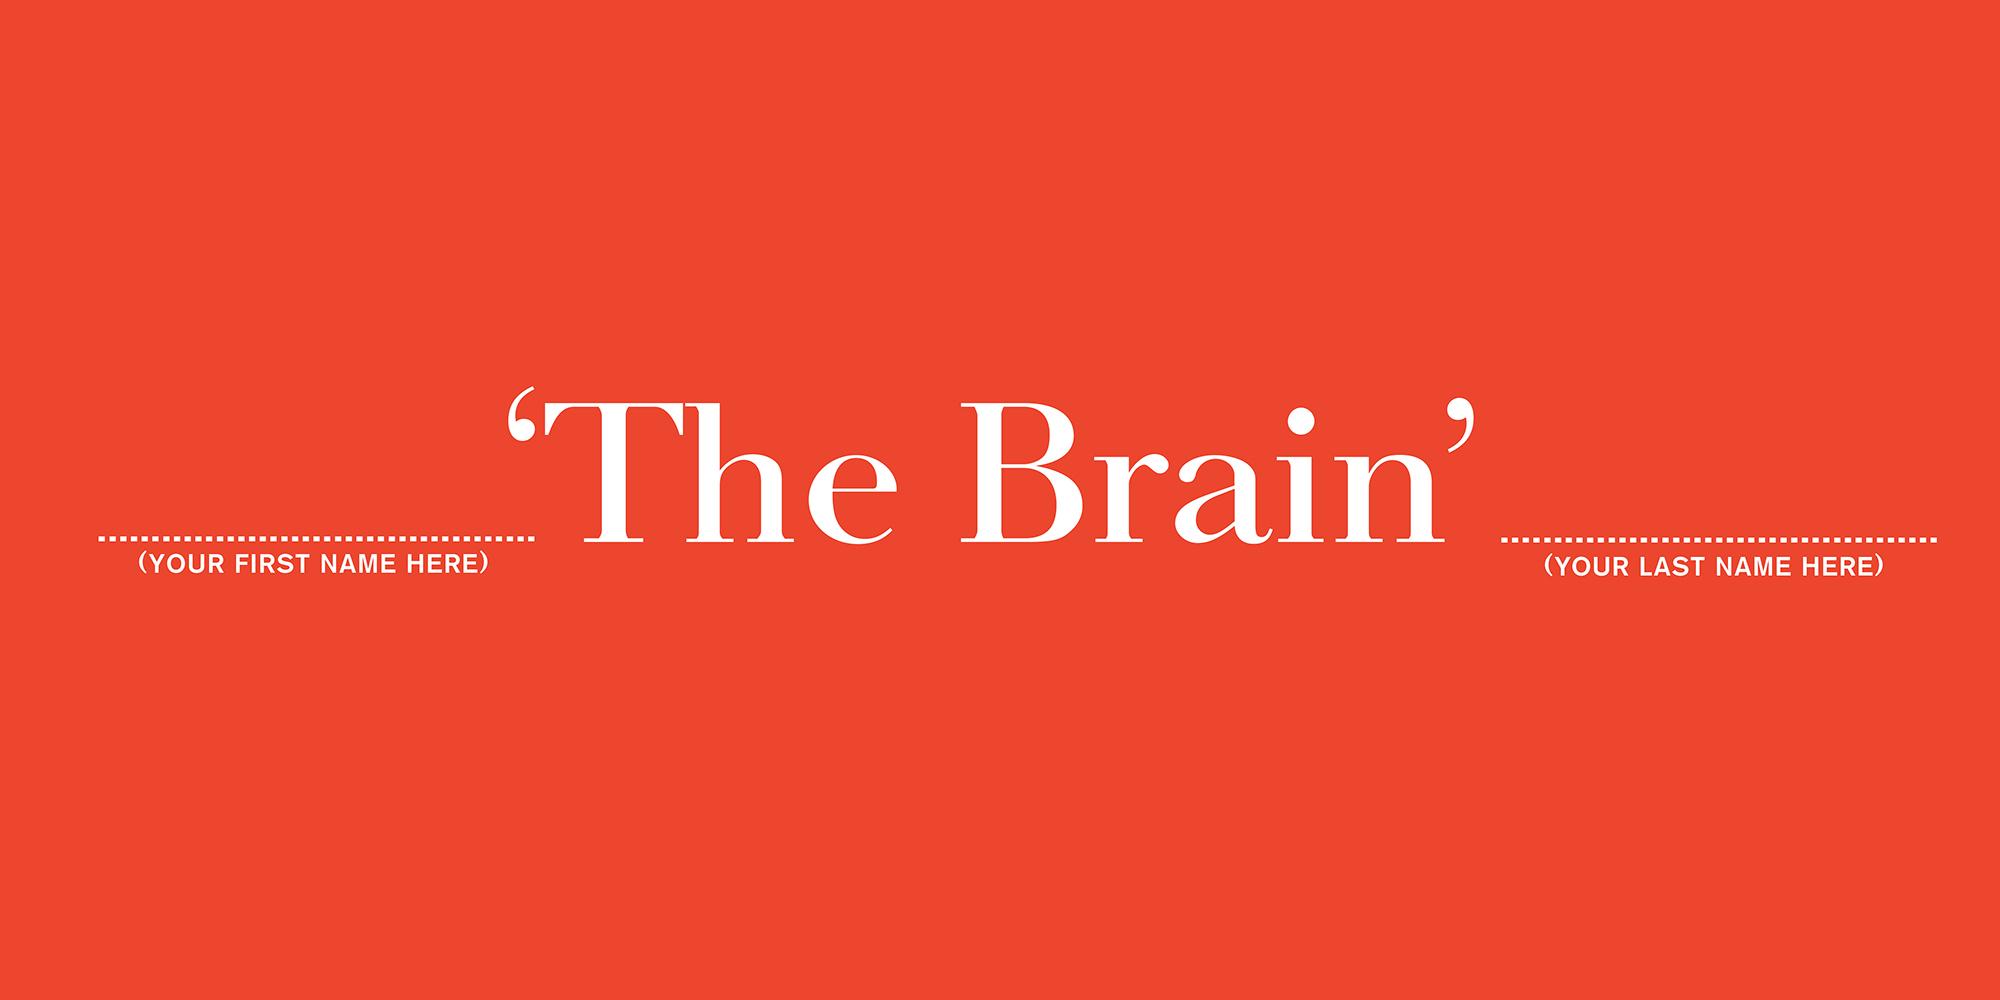 'The Brain' The Economist, Dave Dye, AMV_BBDO